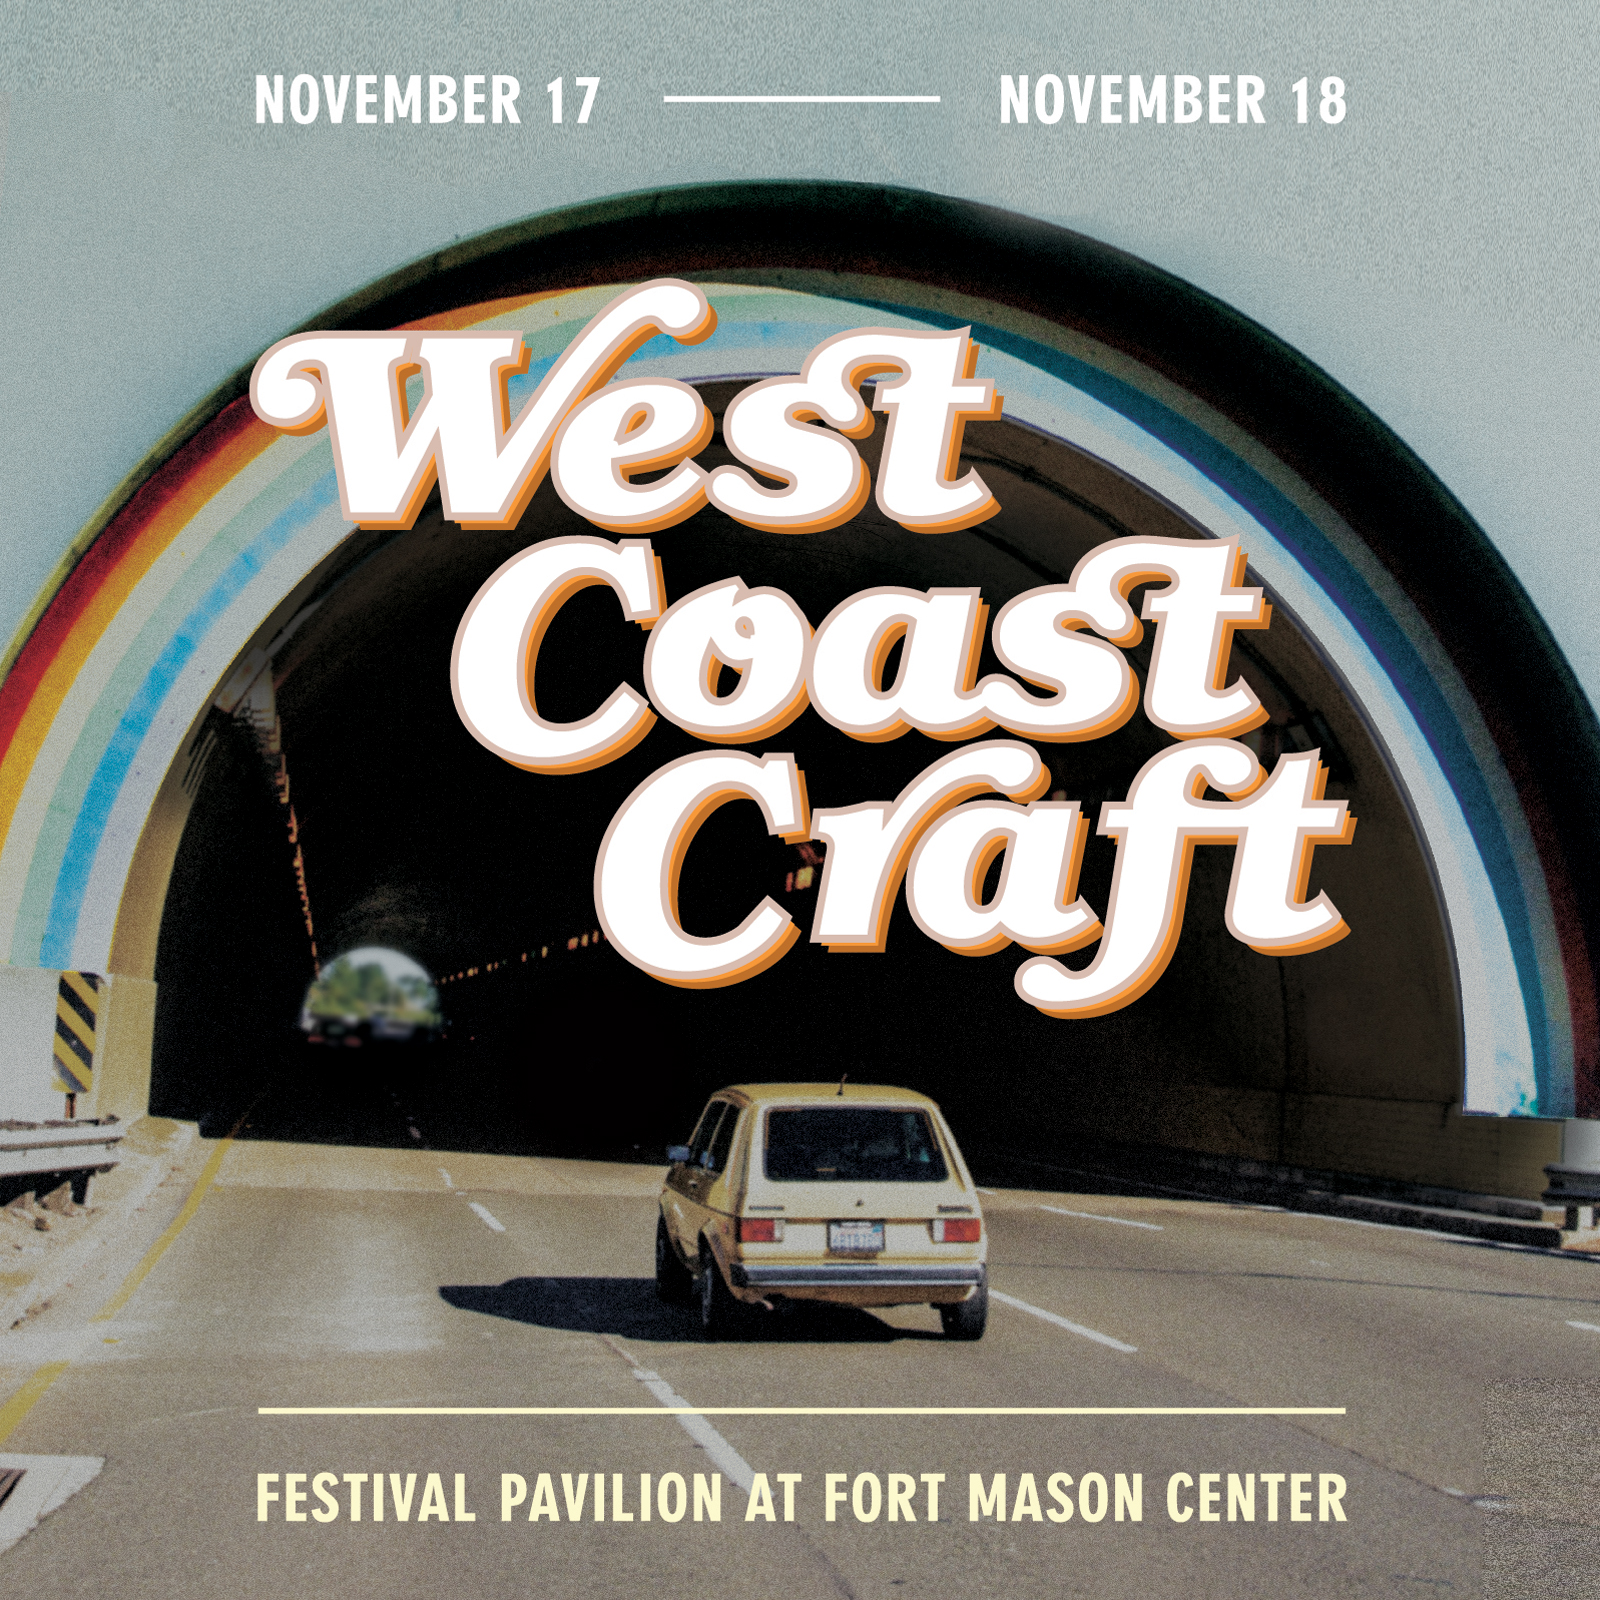 West Coast Craft   Winter Design Show  Fort Mason Center San Fransisco, CA  November 17-18 2018